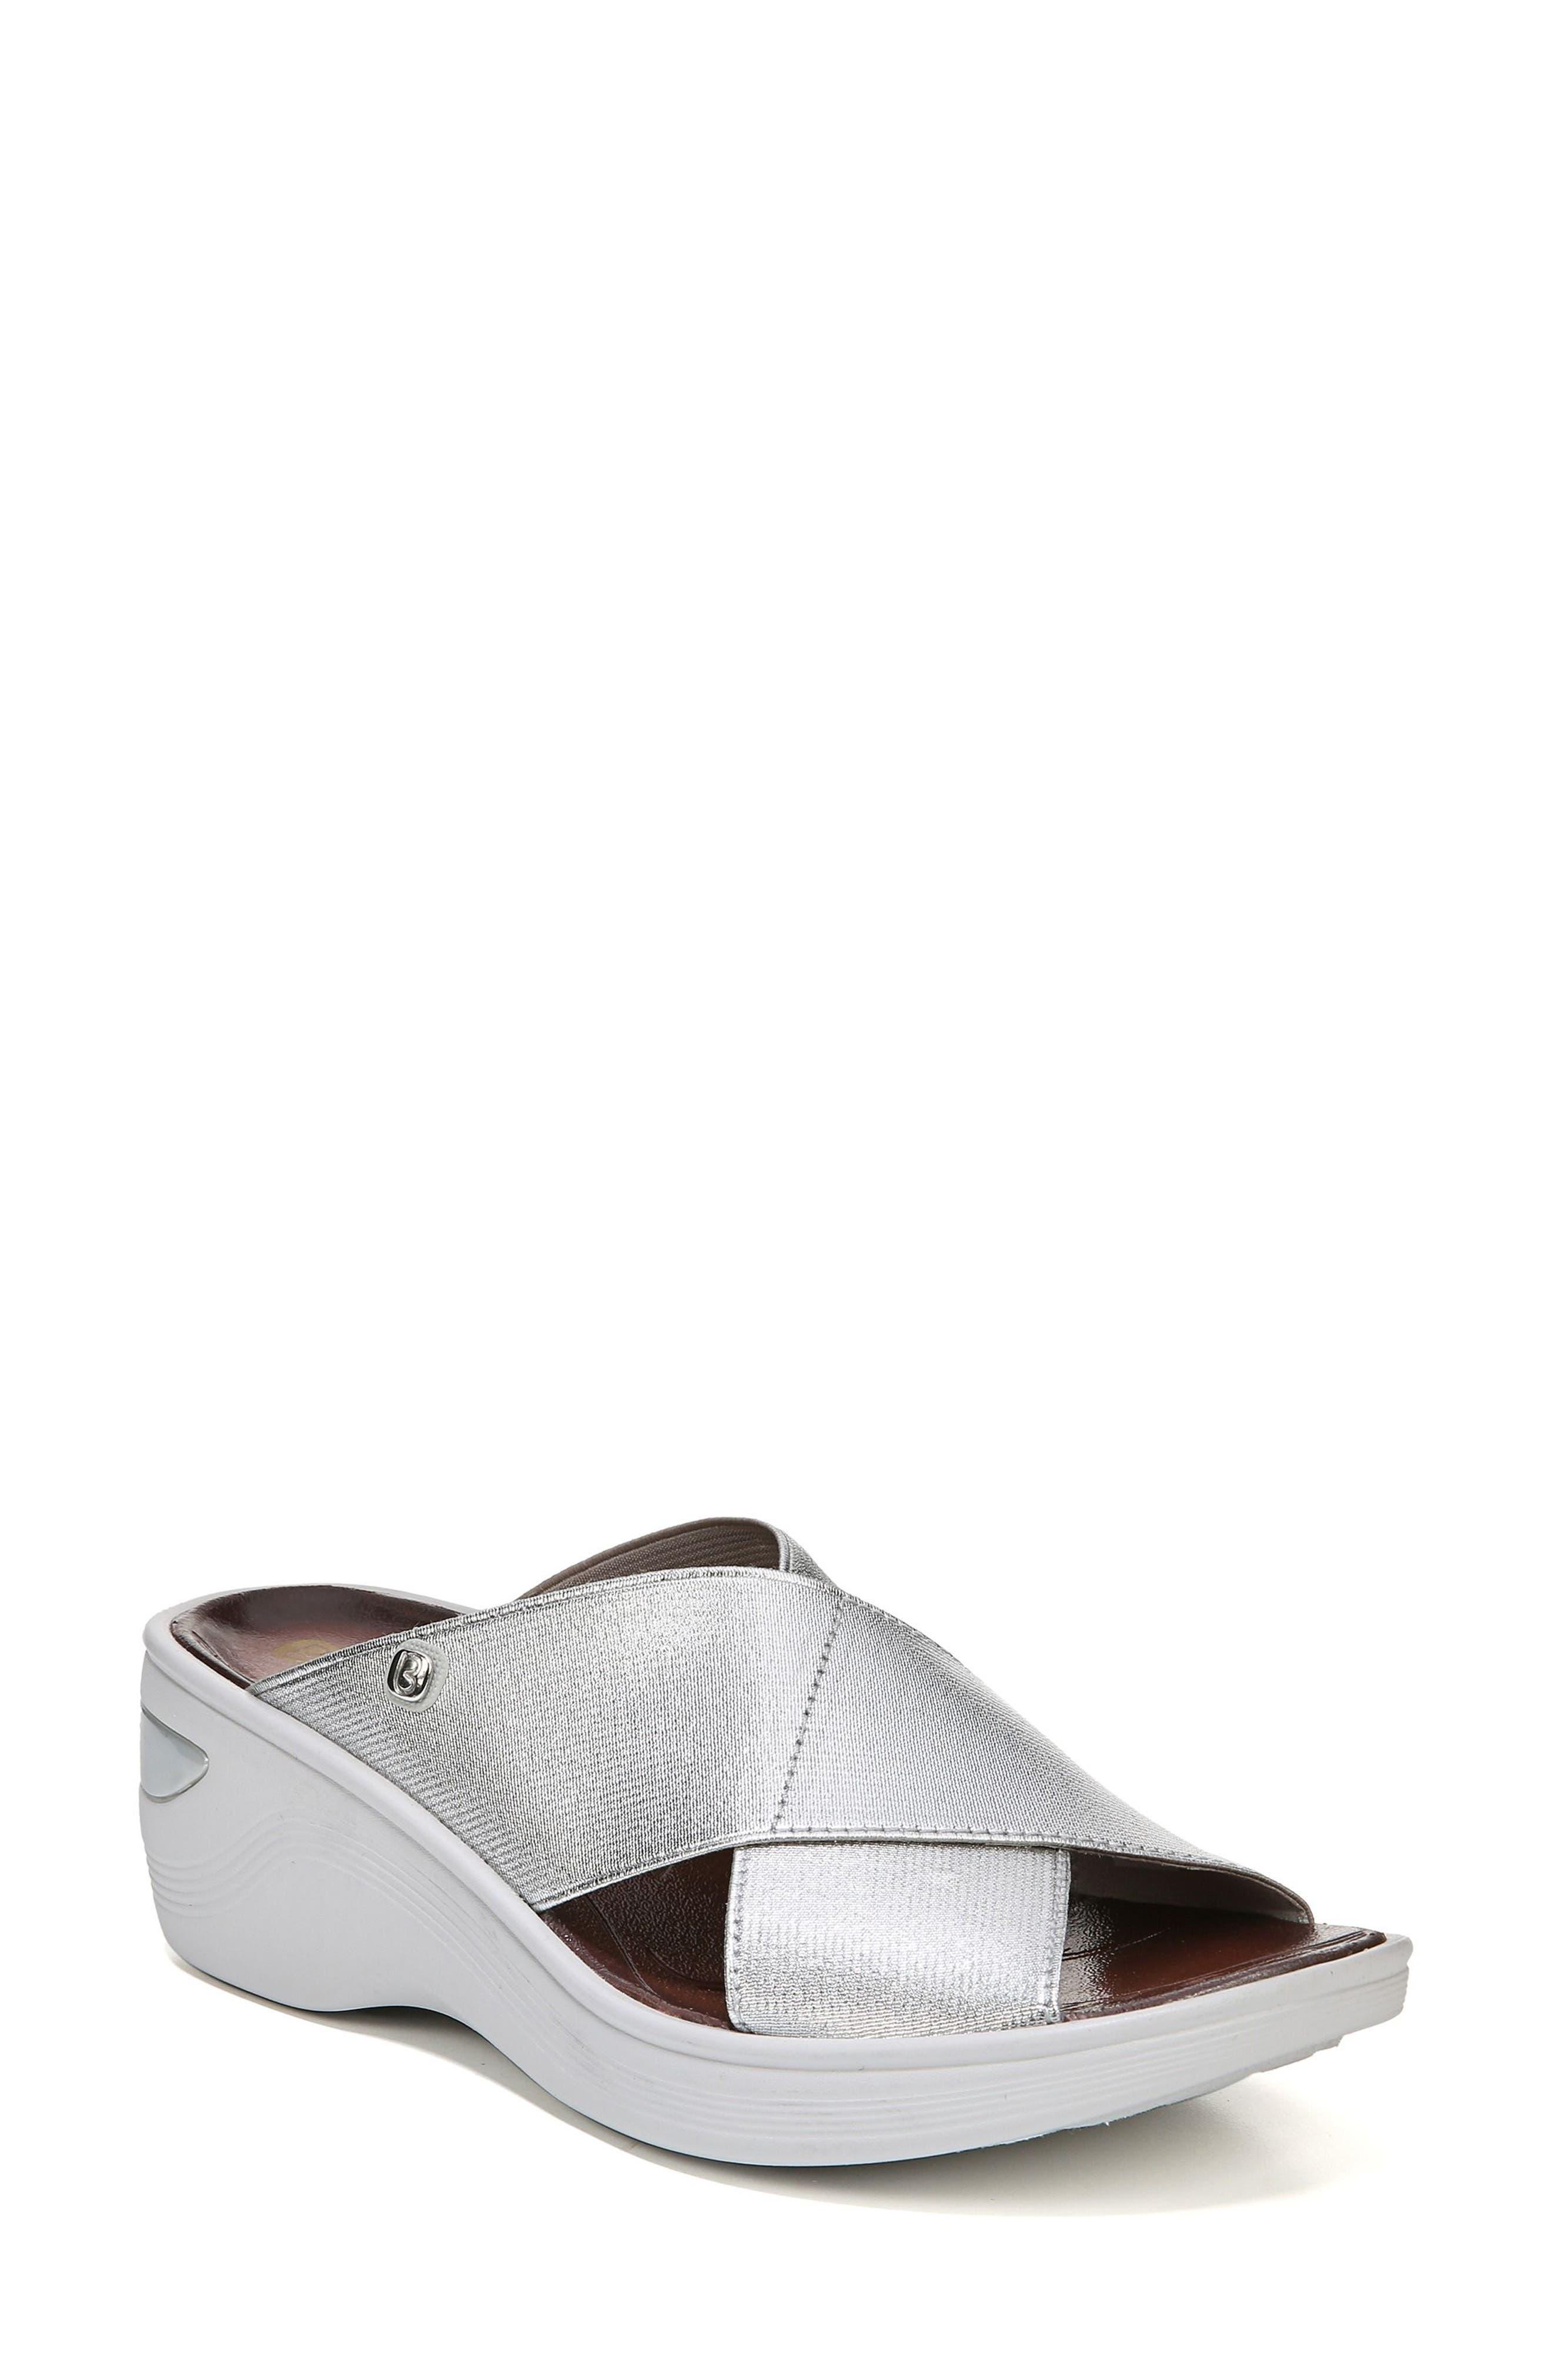 BZEES 'Desire' Wedge Sandal, Main, color, 040